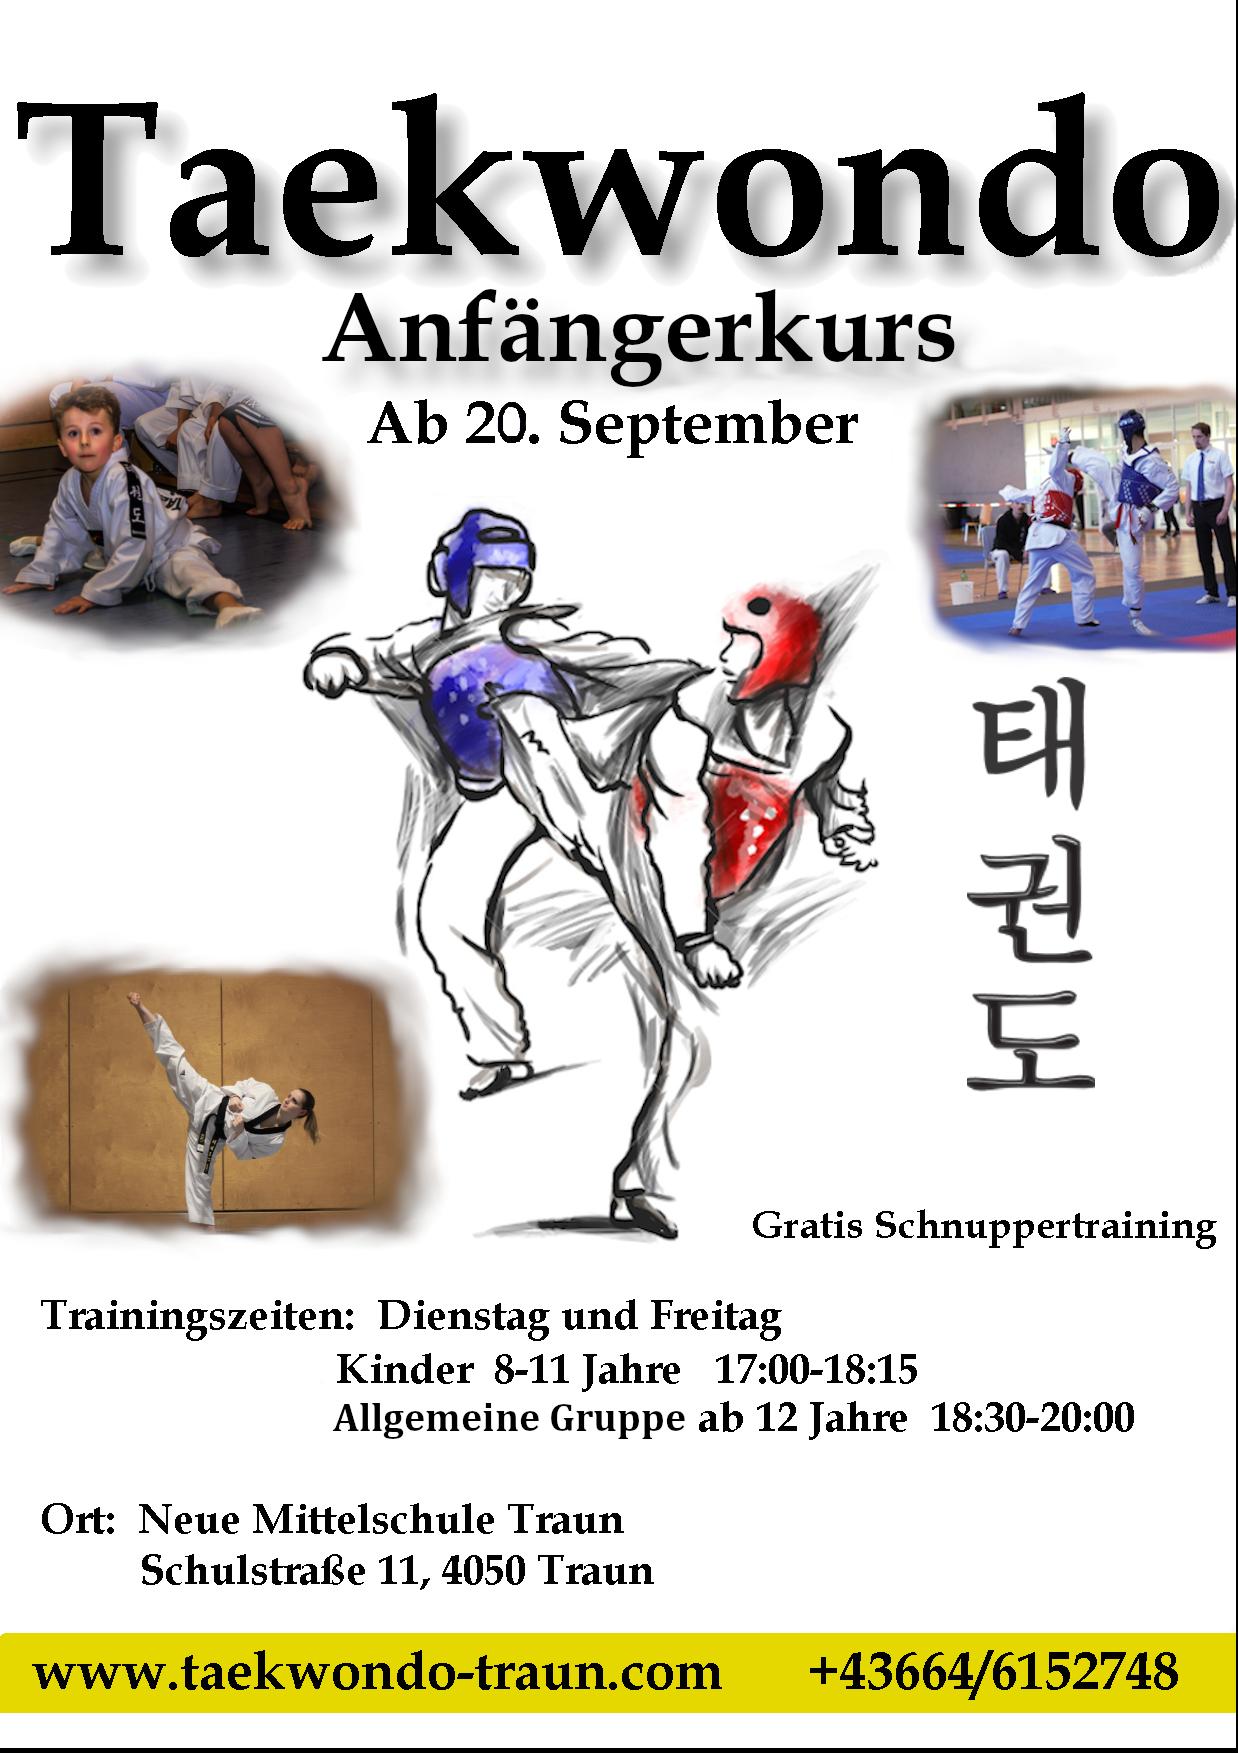 Taekwondo Anfängerkurs & Trainingsstart 2021/22